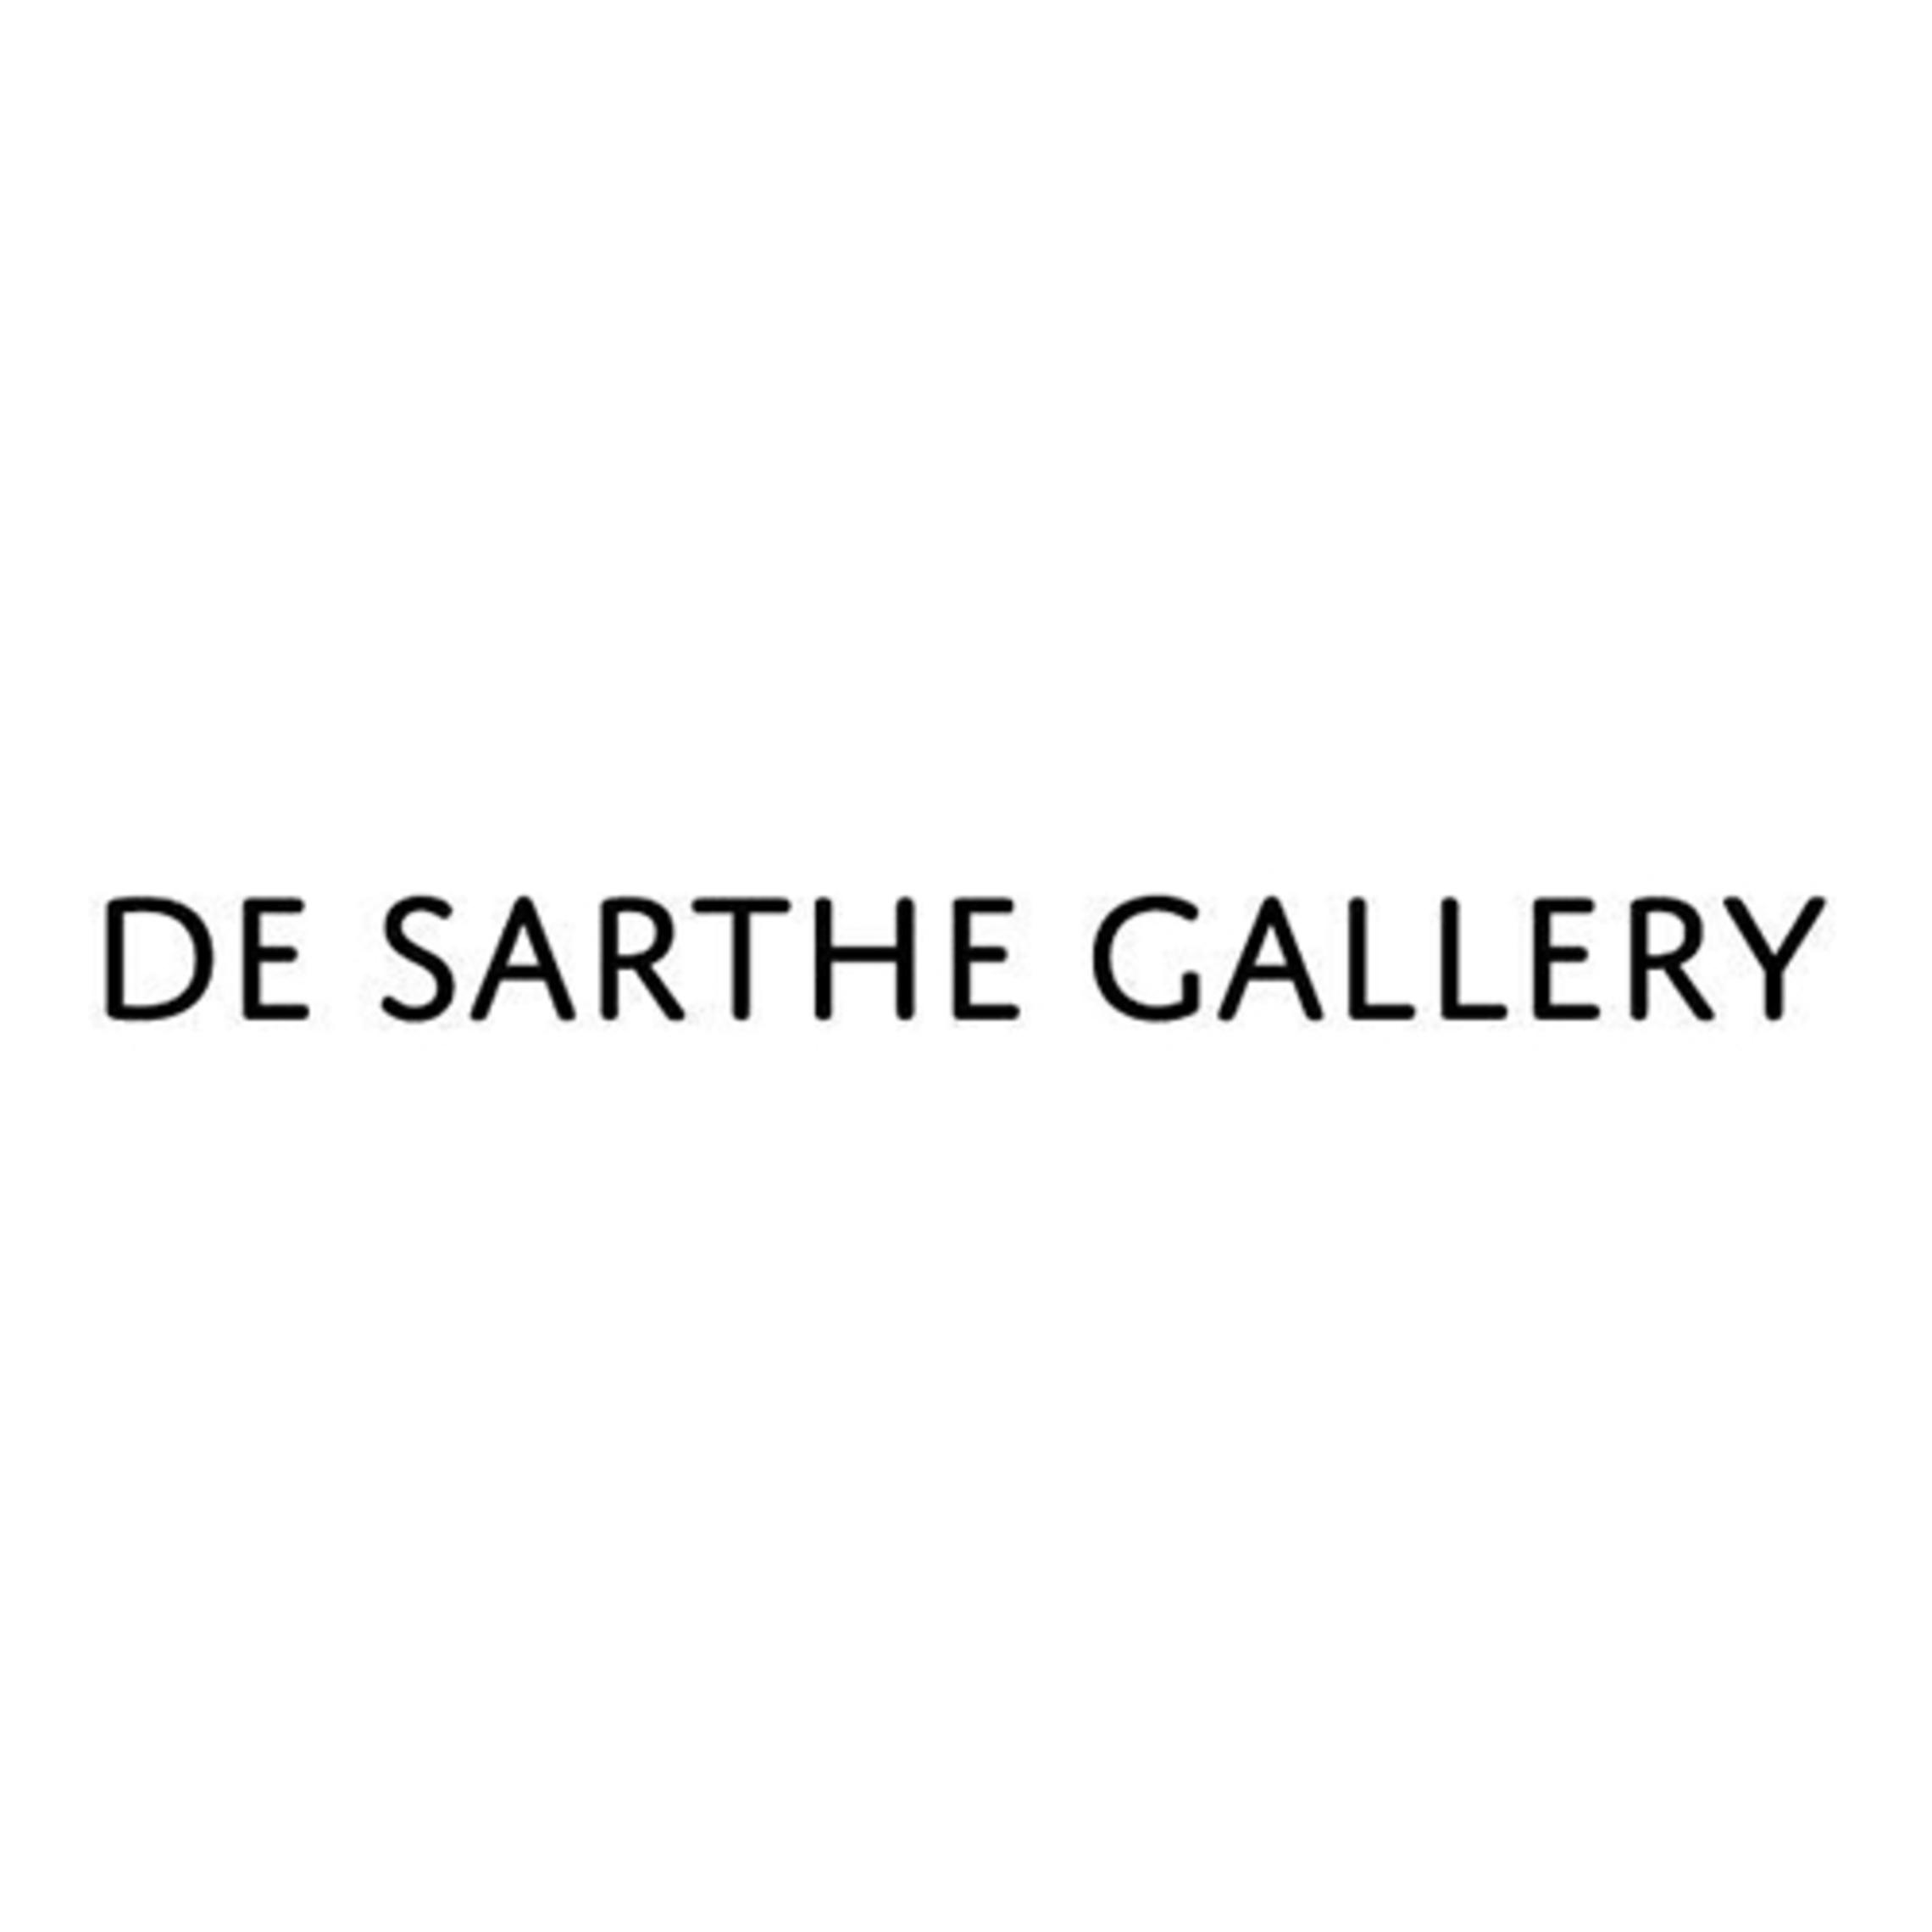 de sarthe gallery- company logo